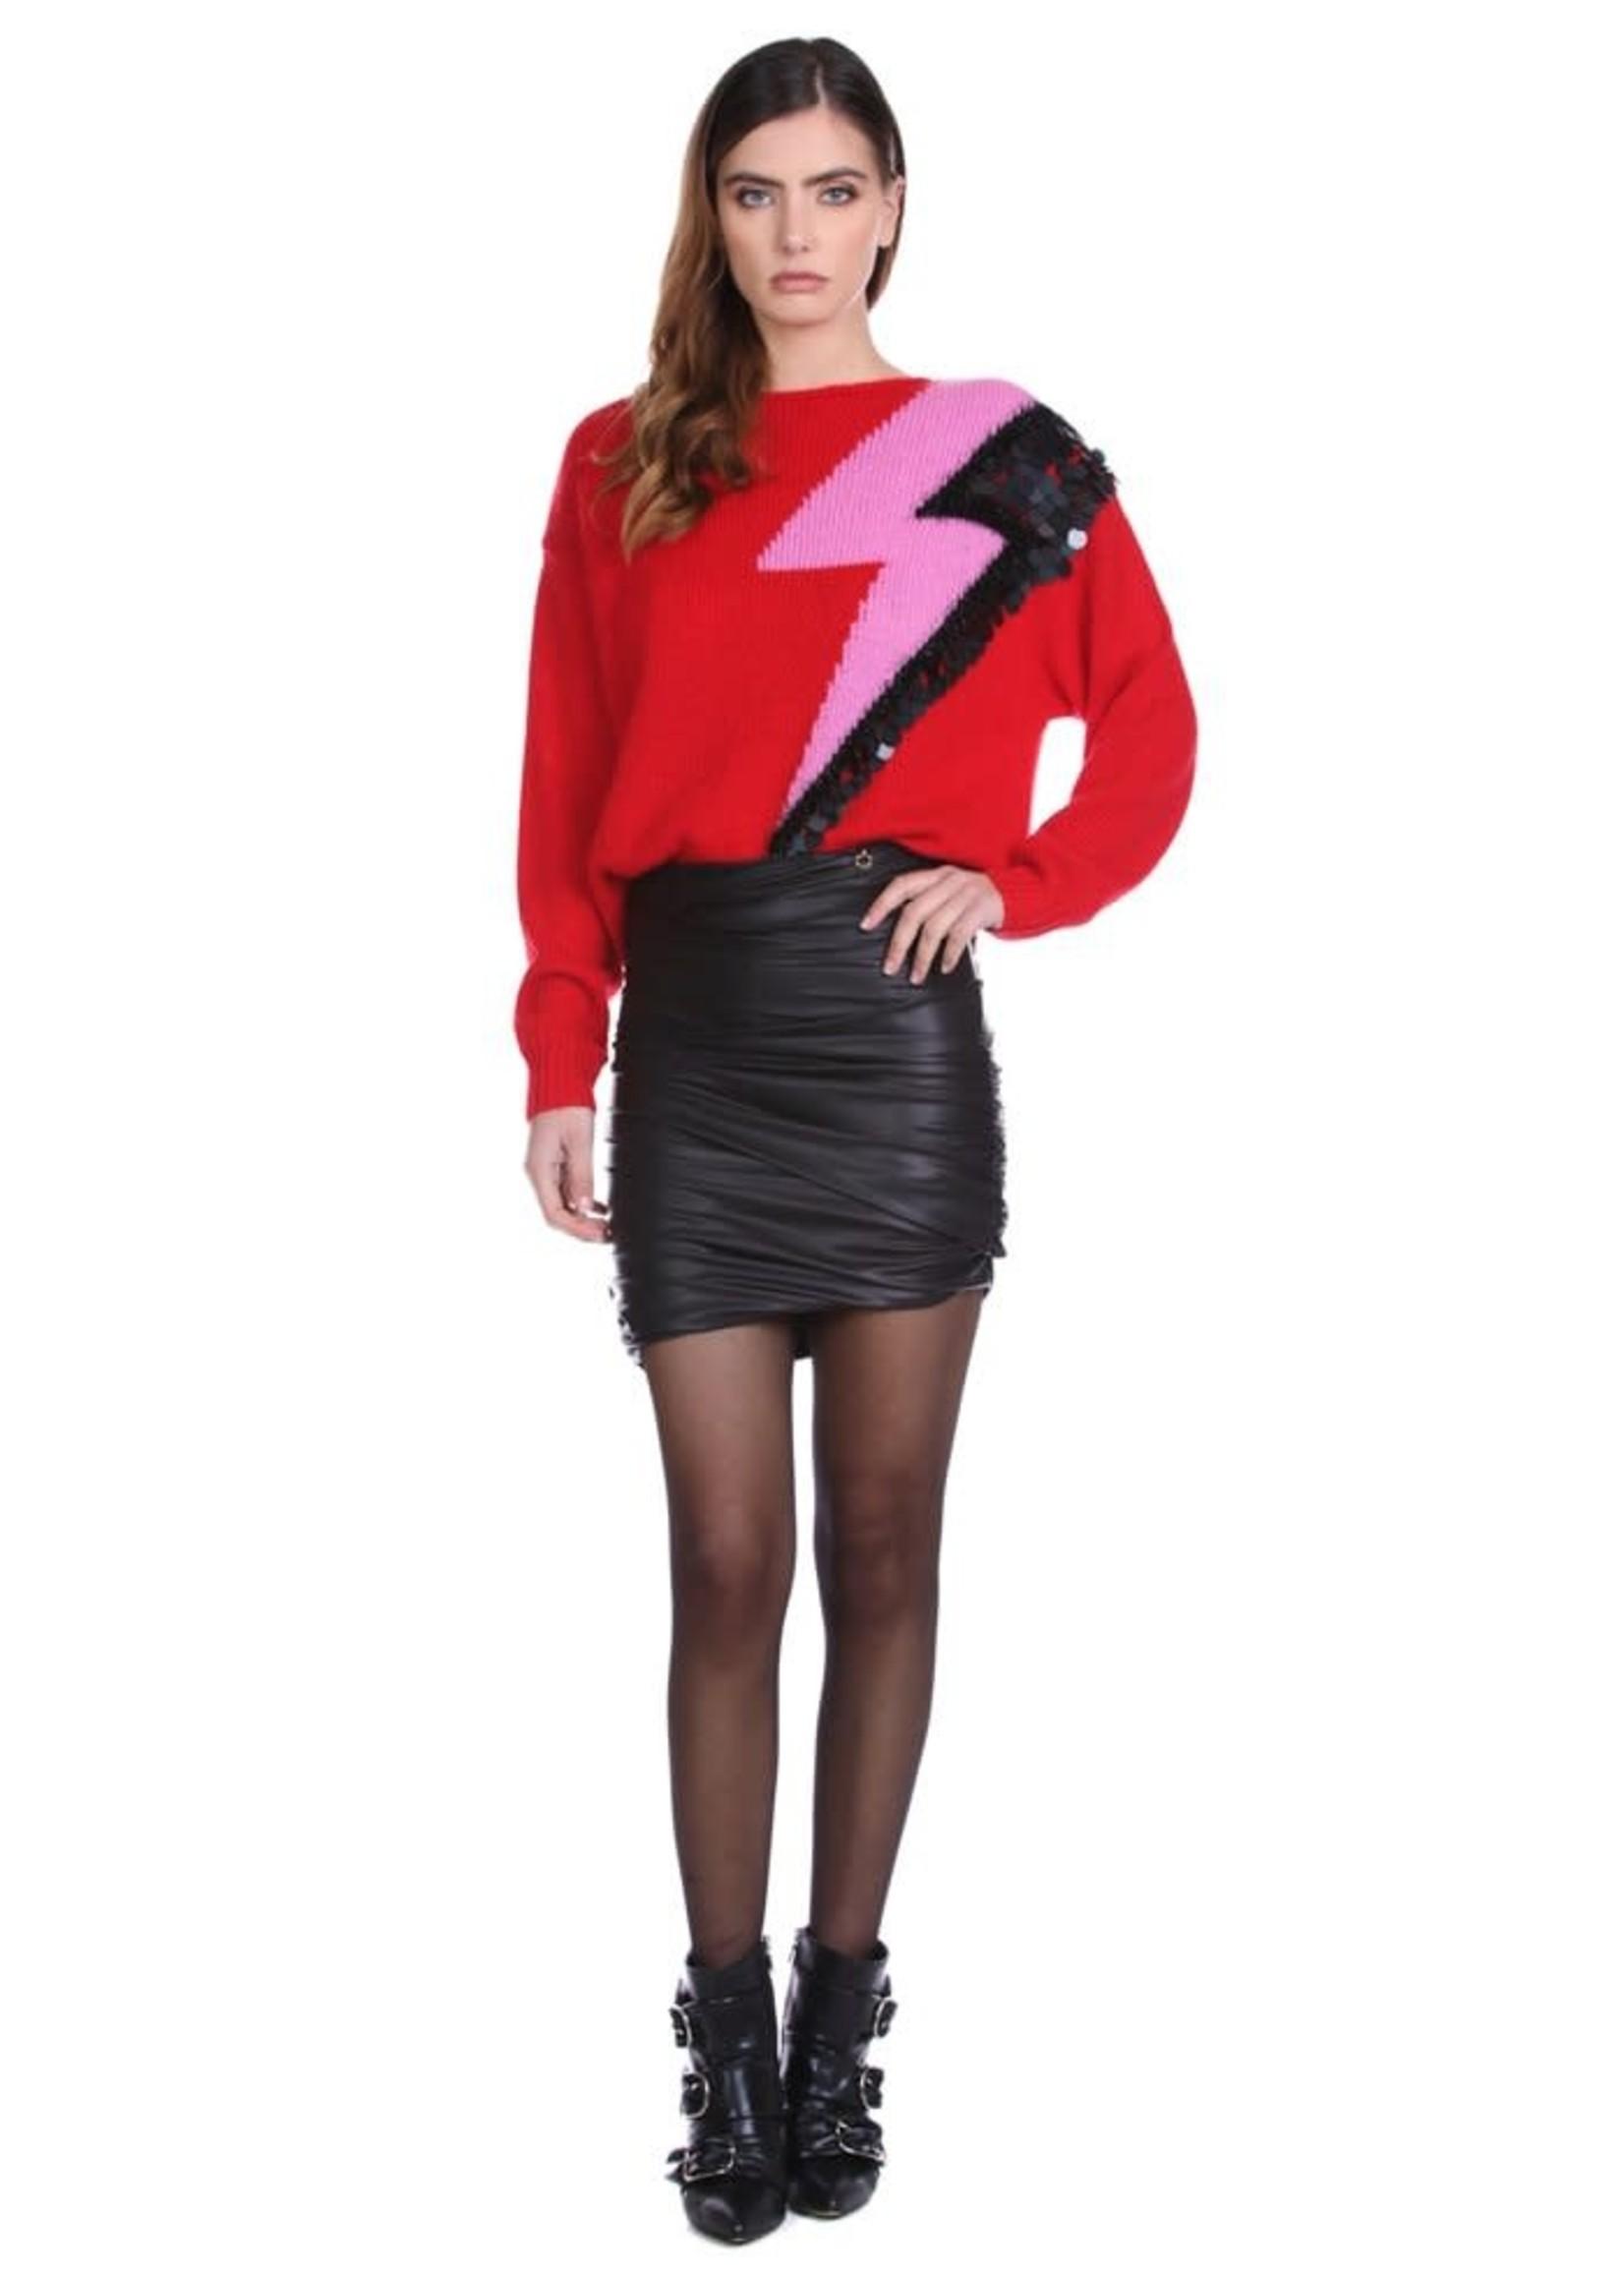 Relish XERFON-trui met lange mouwen met lurex-jacquard en bliksempailletten